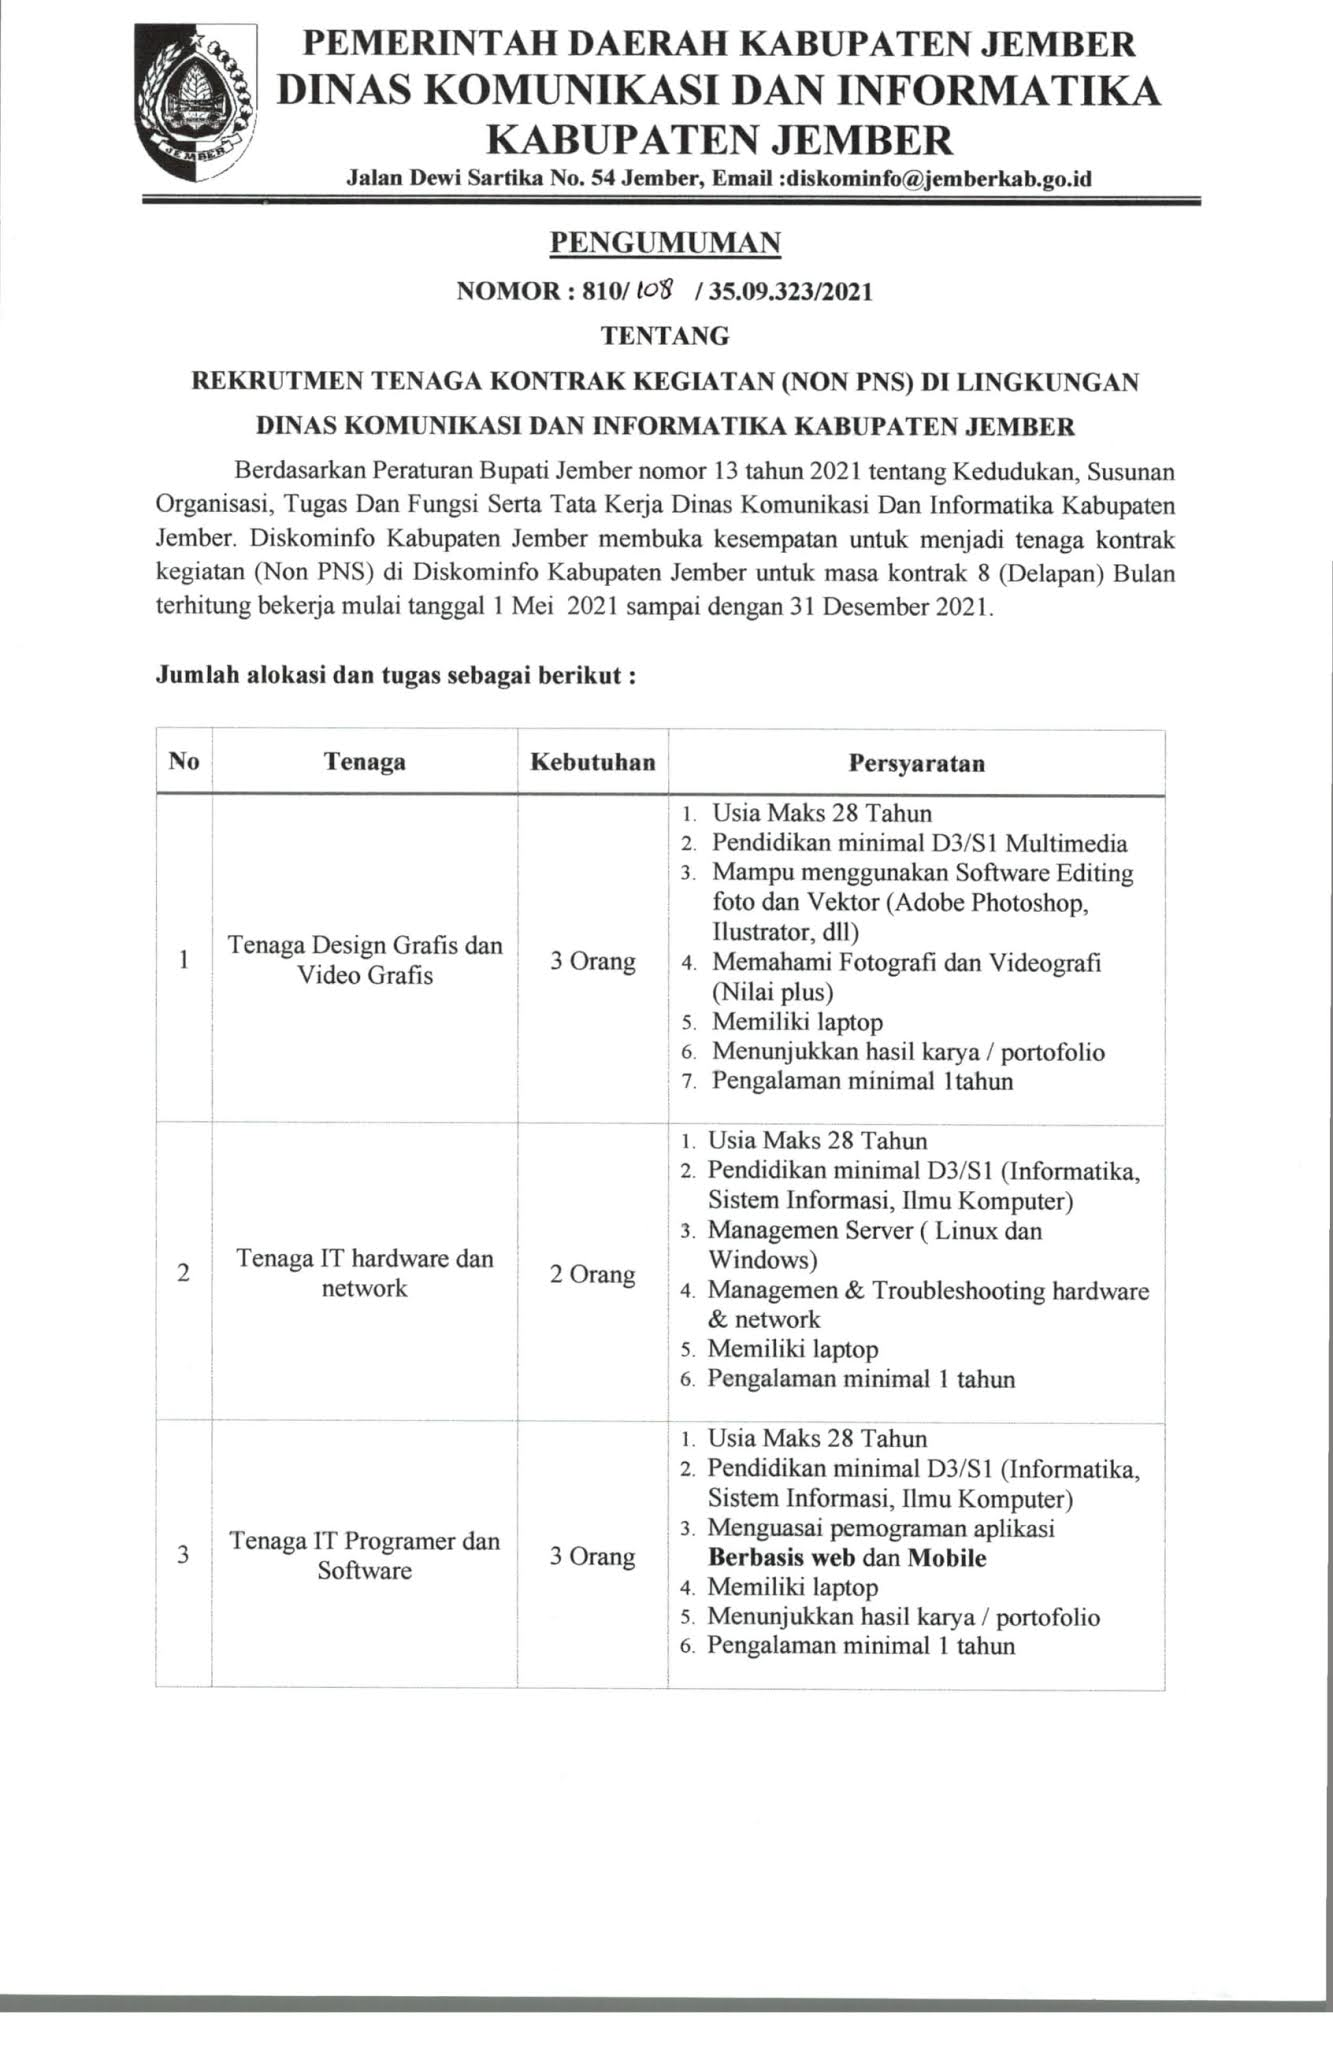 Lowongan Kerja Non Pns Lingkungan Dinas Komunikasi Dan Informatika Tingkat D3 S1 April 2021 Rekrutmen Lowongan Kerja Bulan Juli 2021